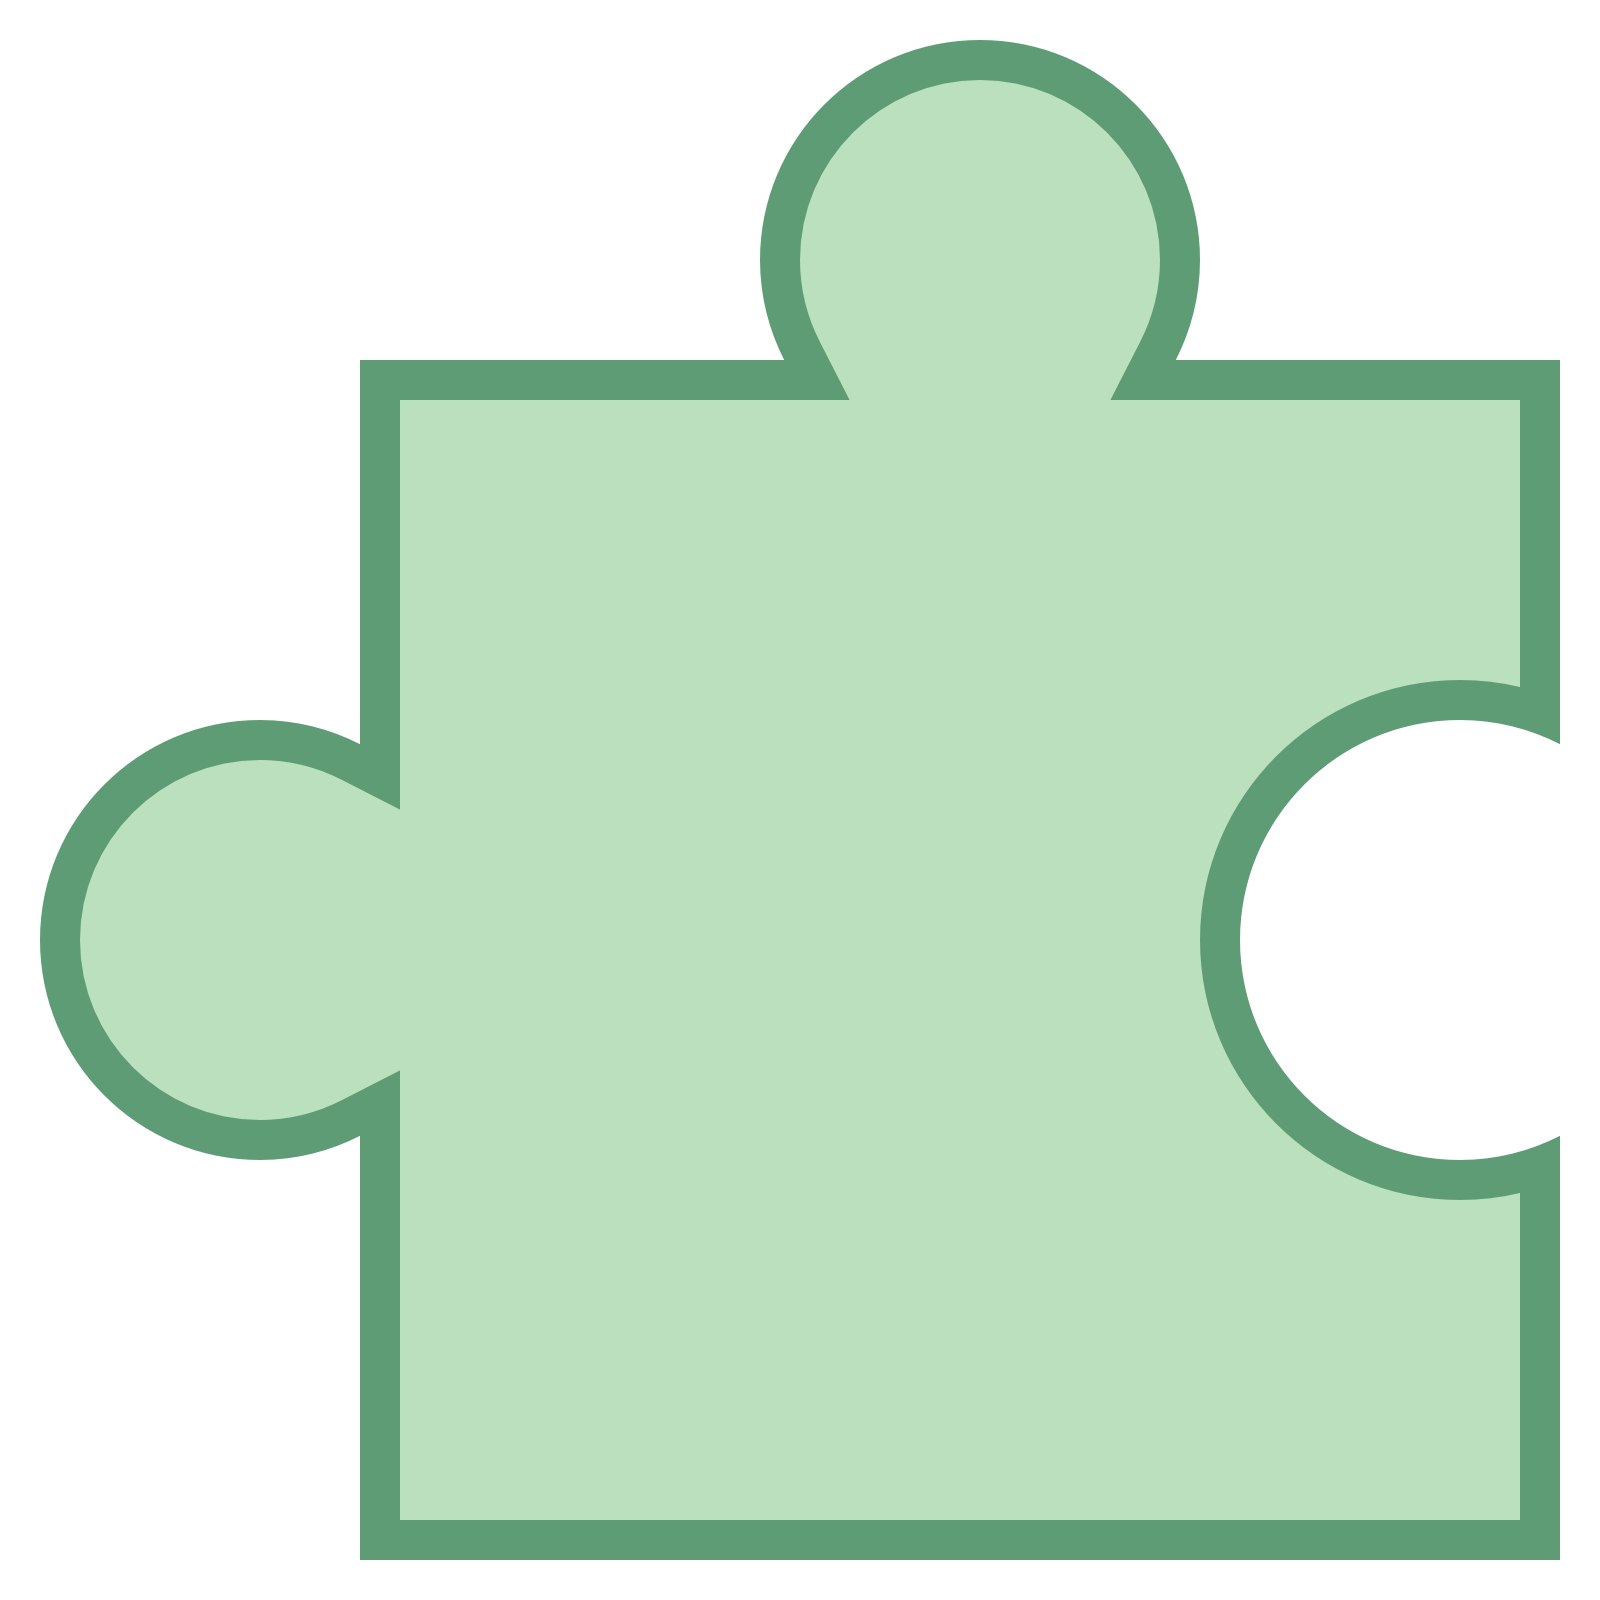 Puzzle clipart symbol. Computer icons reflex camera